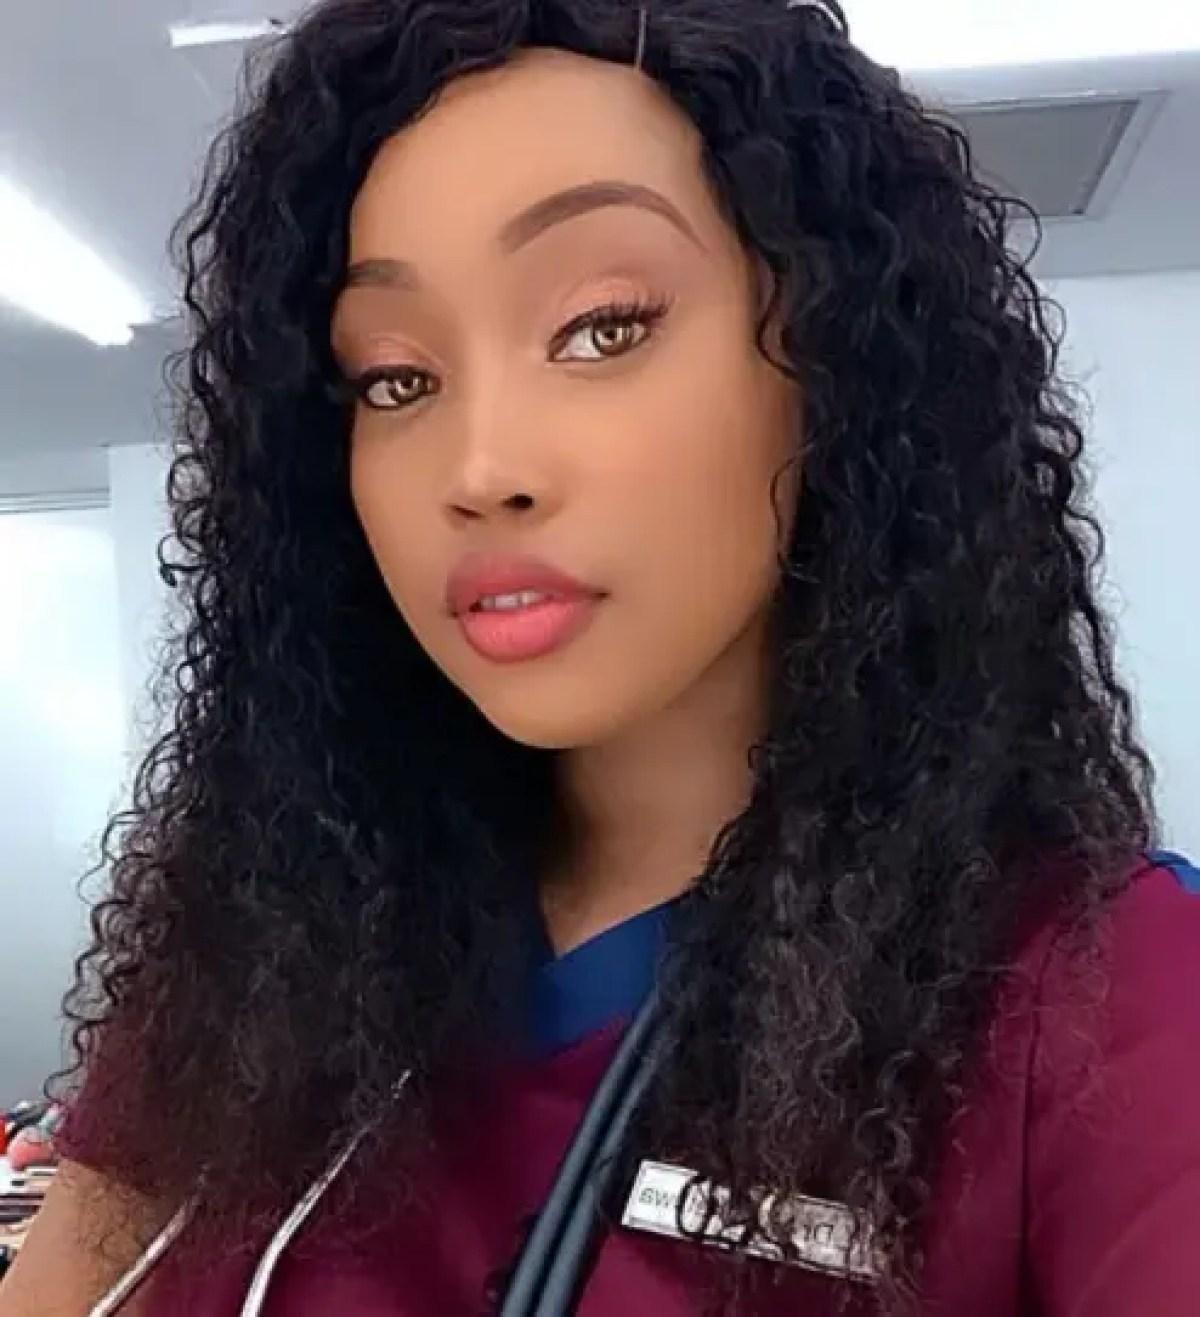 Salaries: Actress Nelisiwe Sibiya 'Dr Mbali Mthetwa' salary at Durban Gen revealed